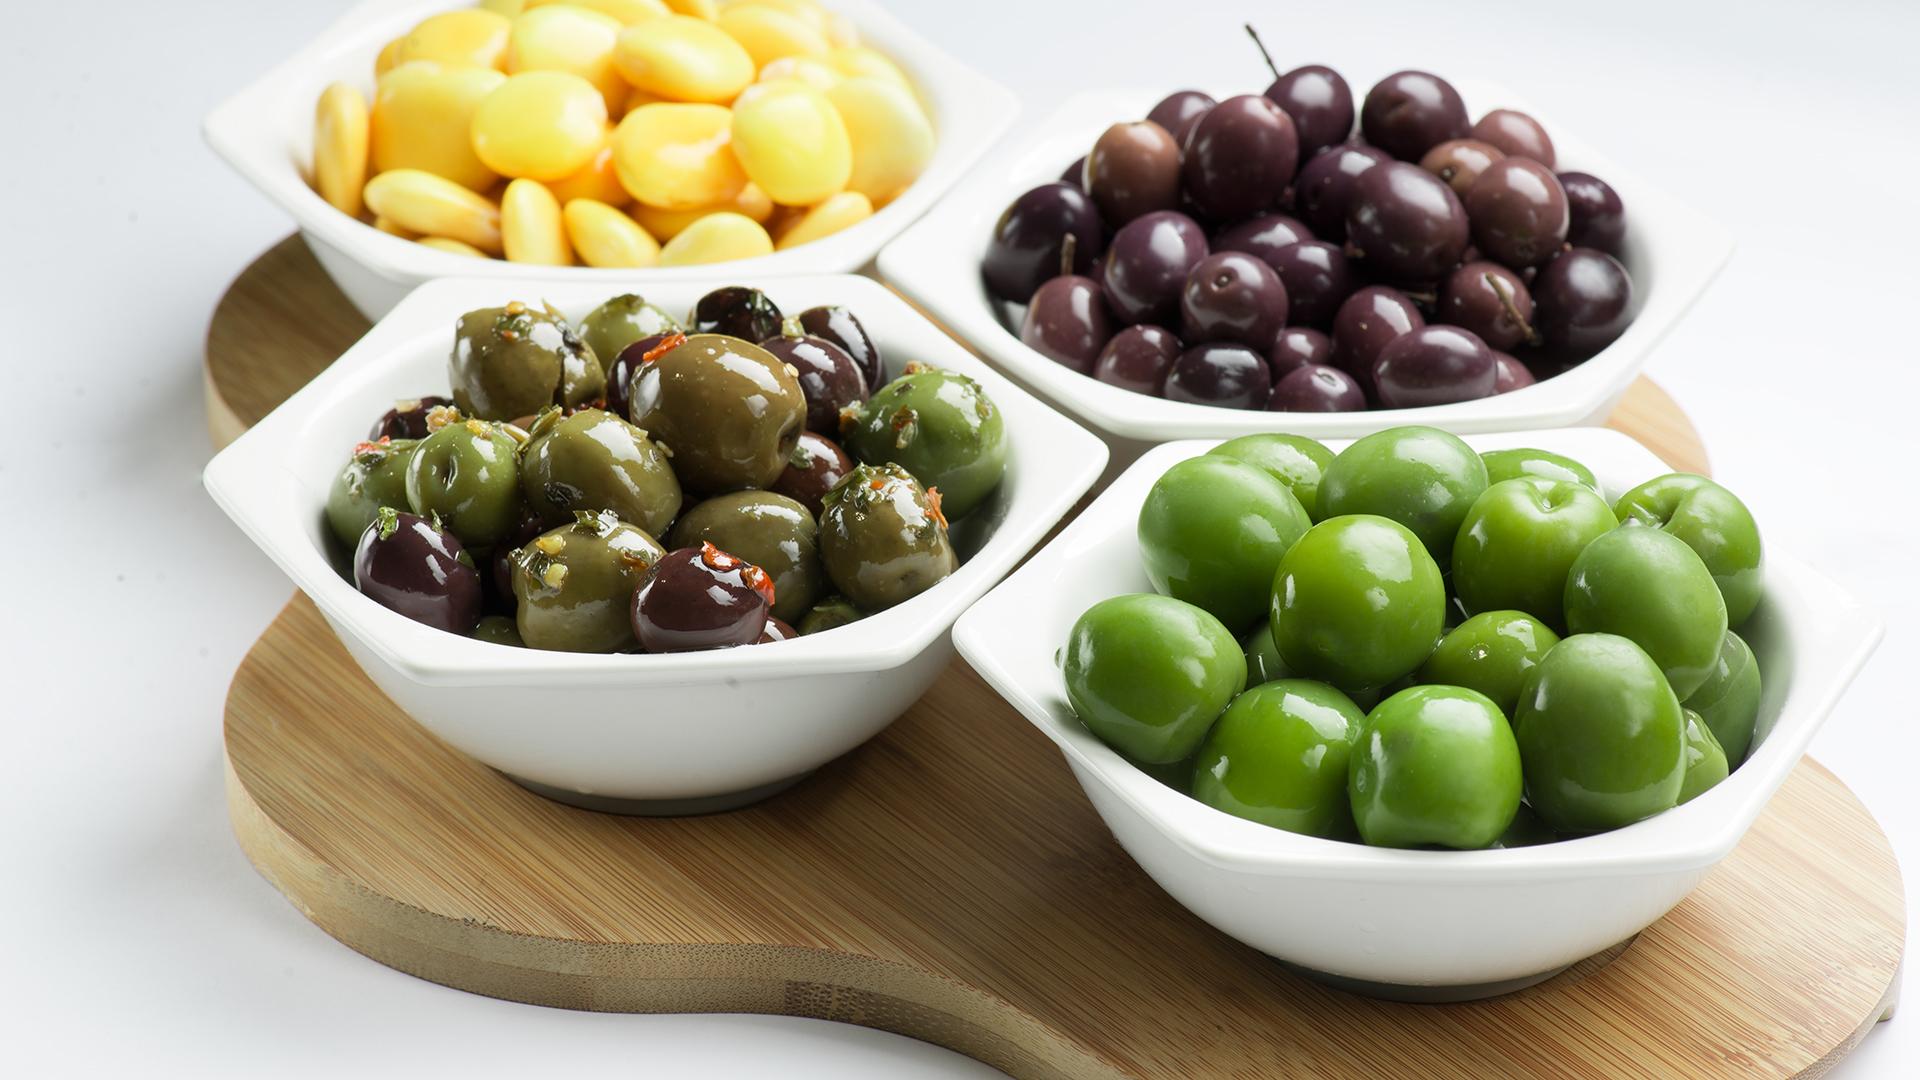 оливки из Испании без химии